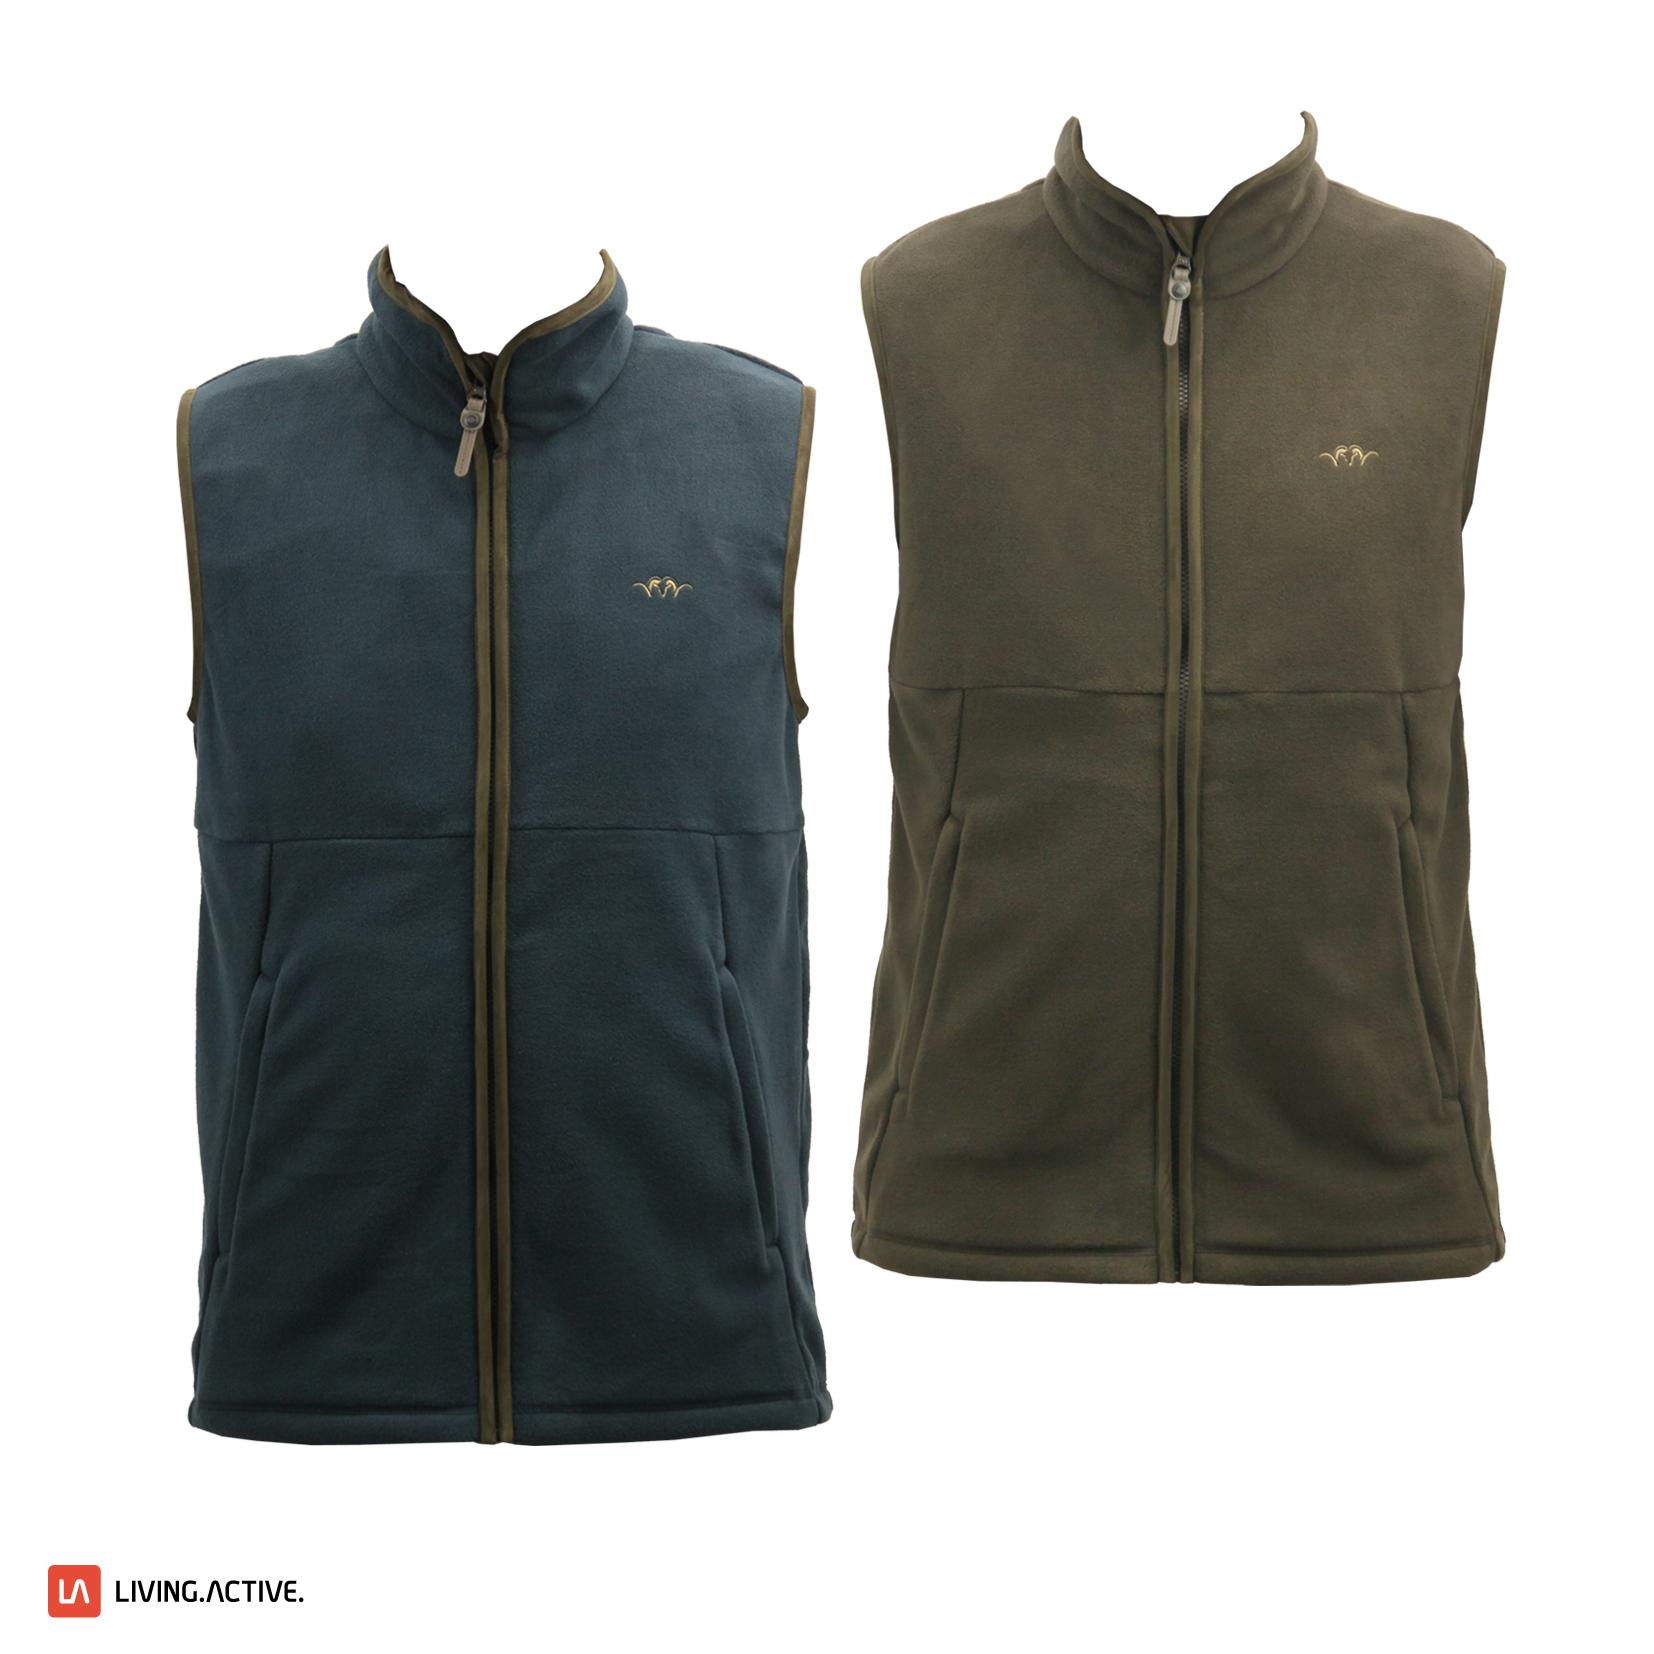 1c02b0ca50 Blaser Basic Fleece Weste Philipp kaufen | LivingActive.de